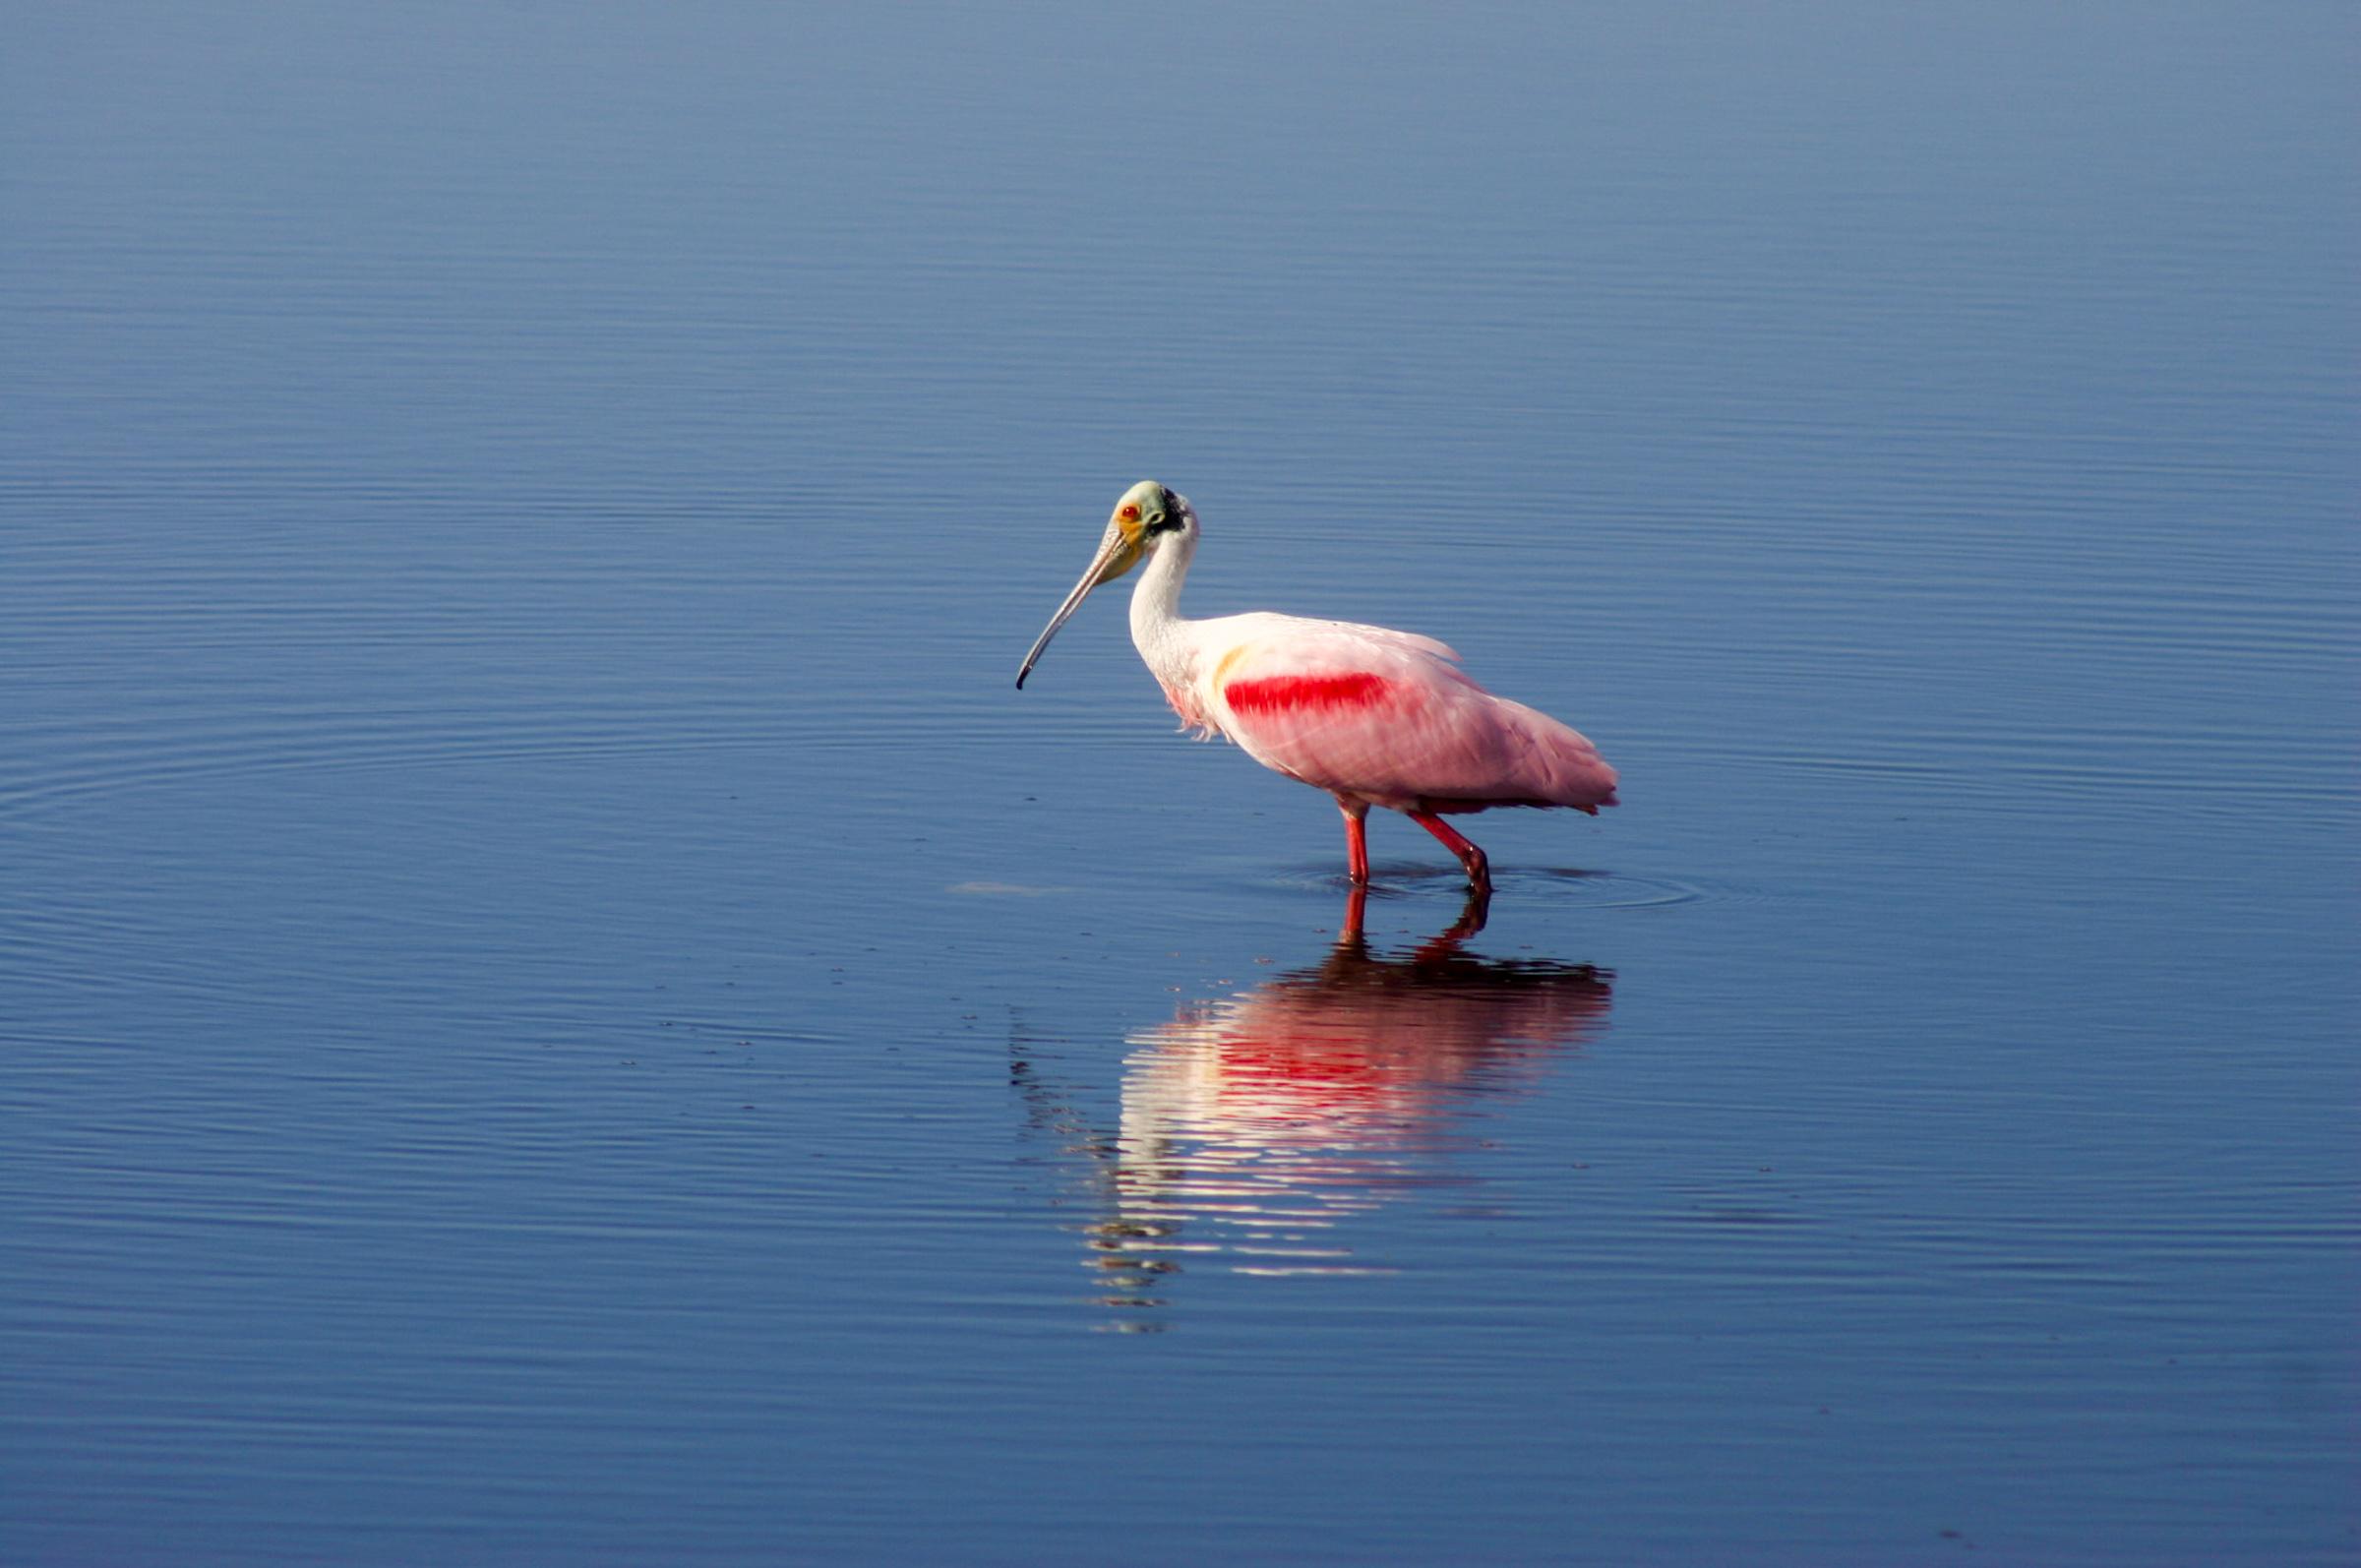 Roseate Spoonbill. Photo: Mark Cloud / Audubon Photography Awards.